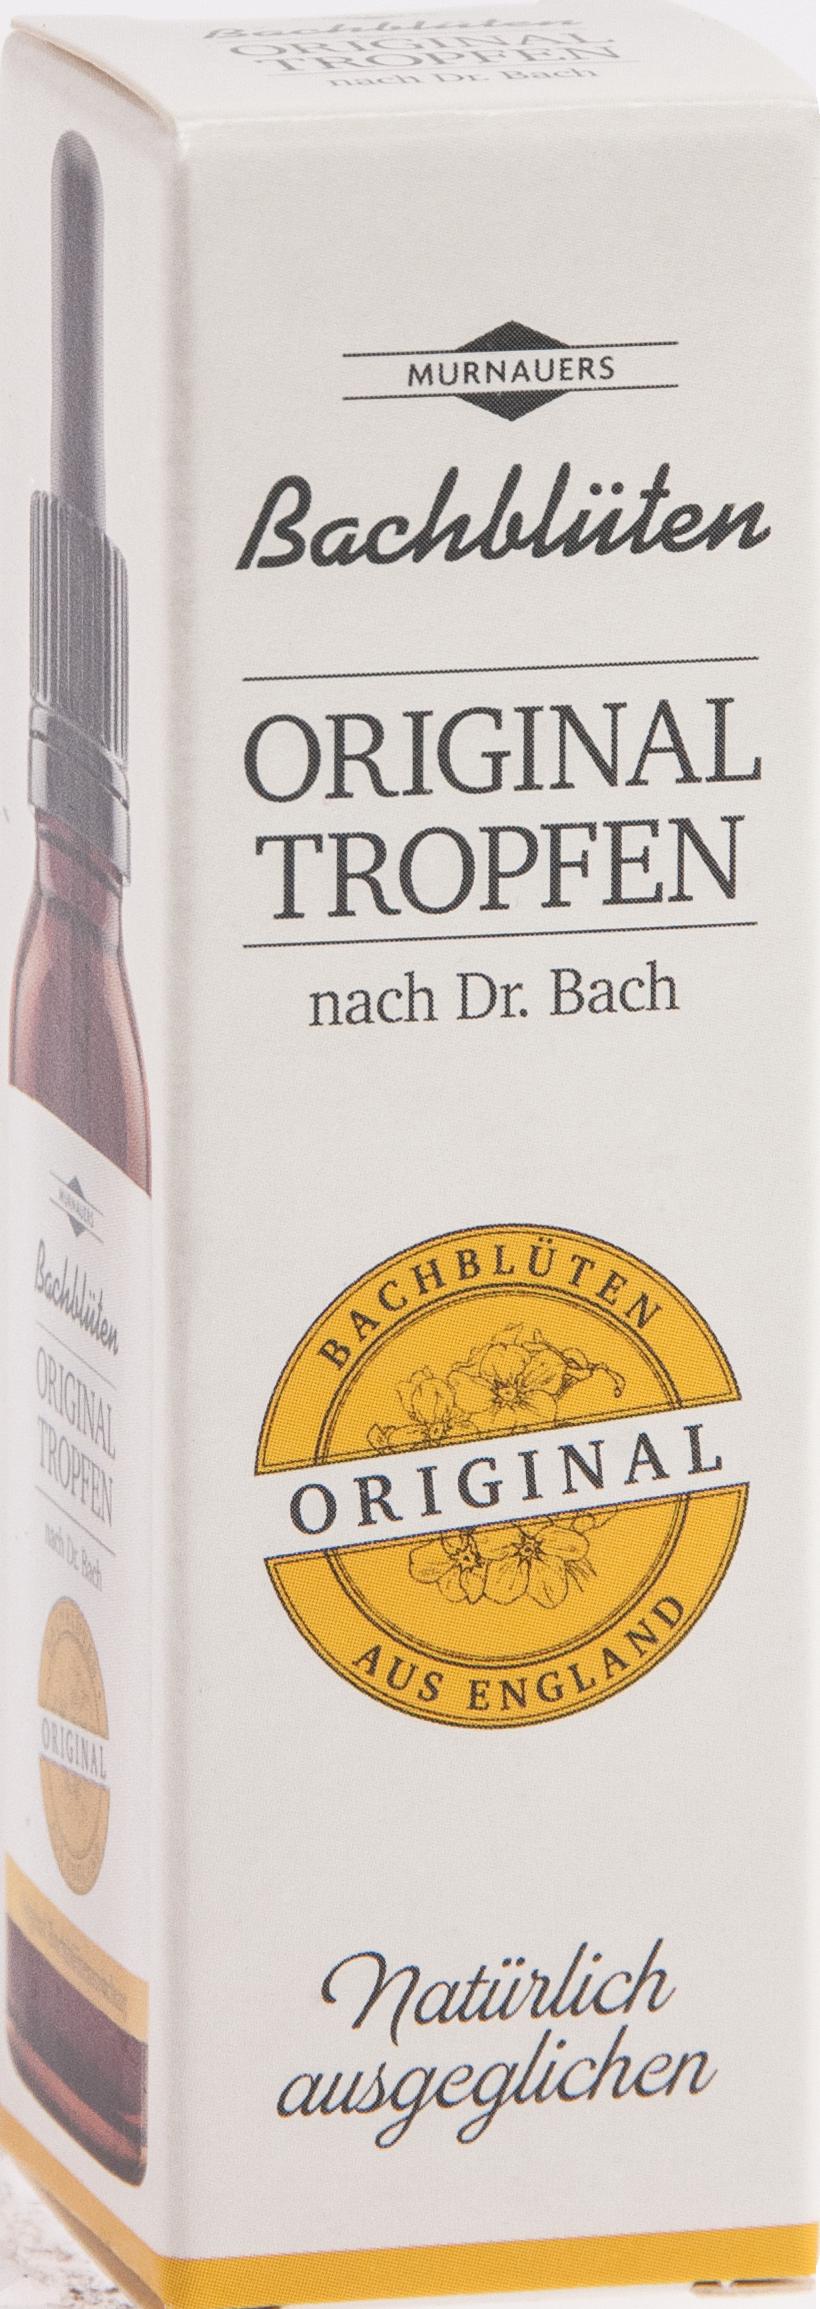 Bachblüten Original Tropfen nach Dr.Bach